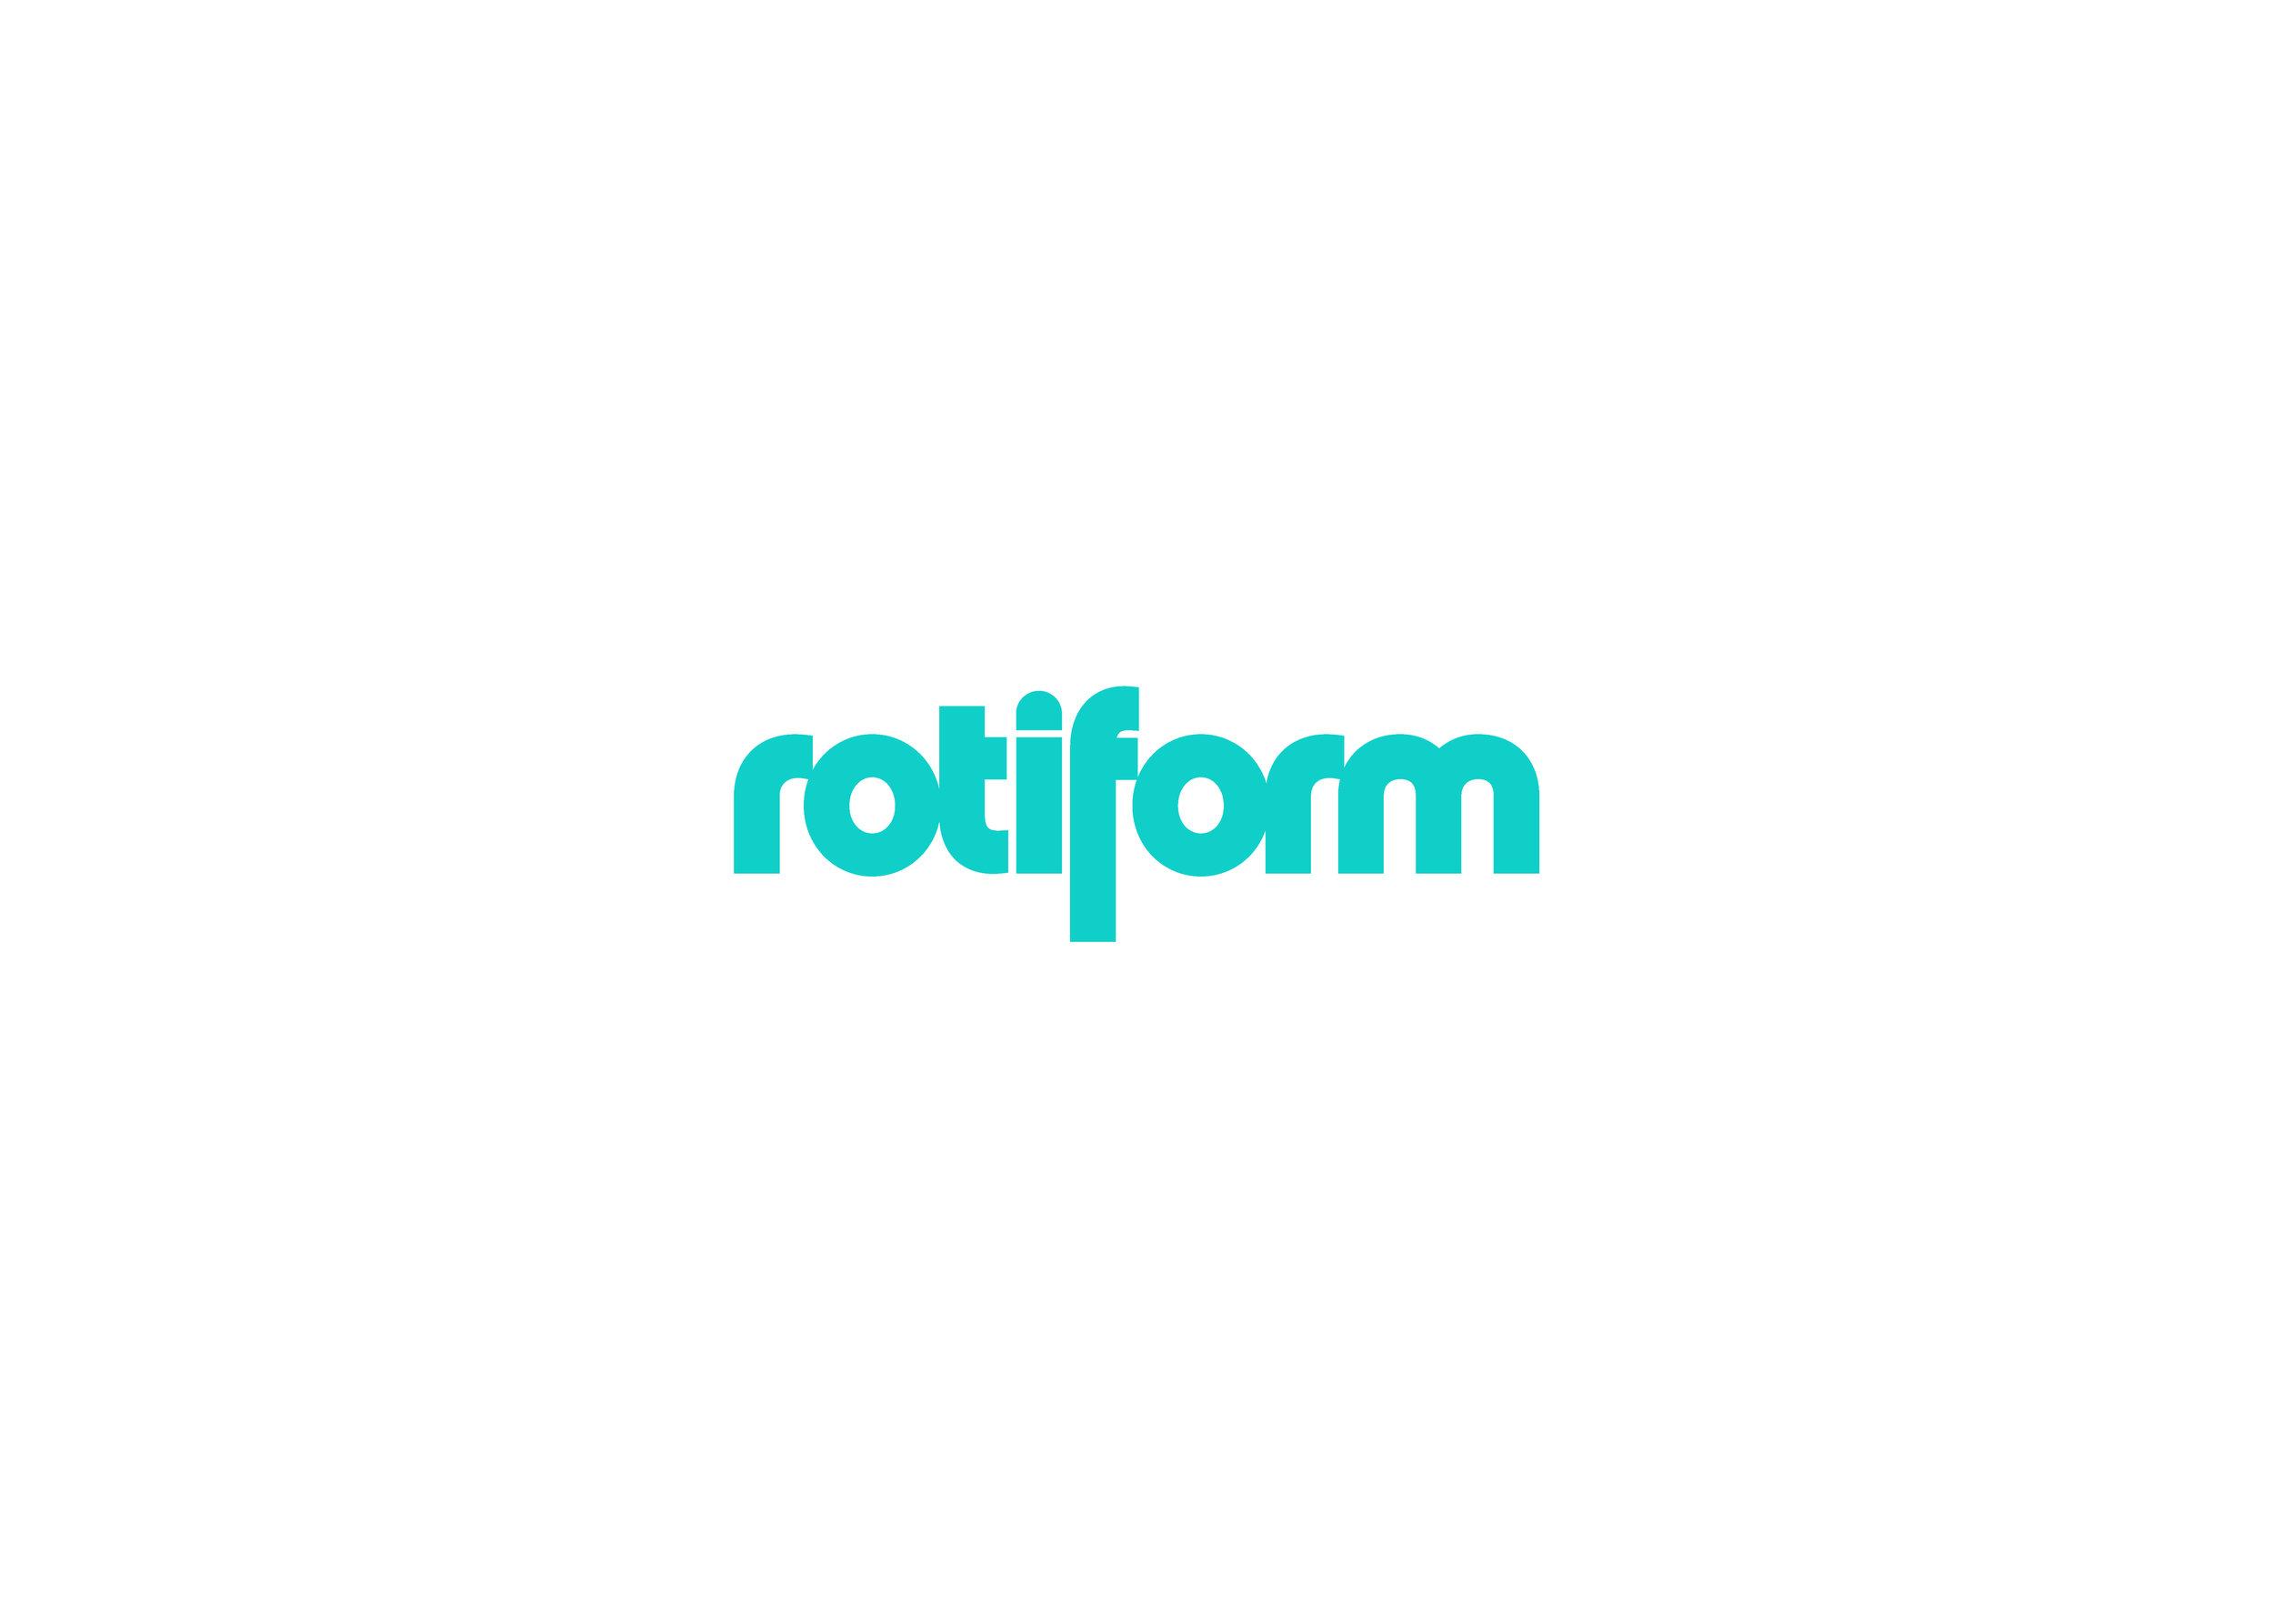 ROTIFORM.jpg